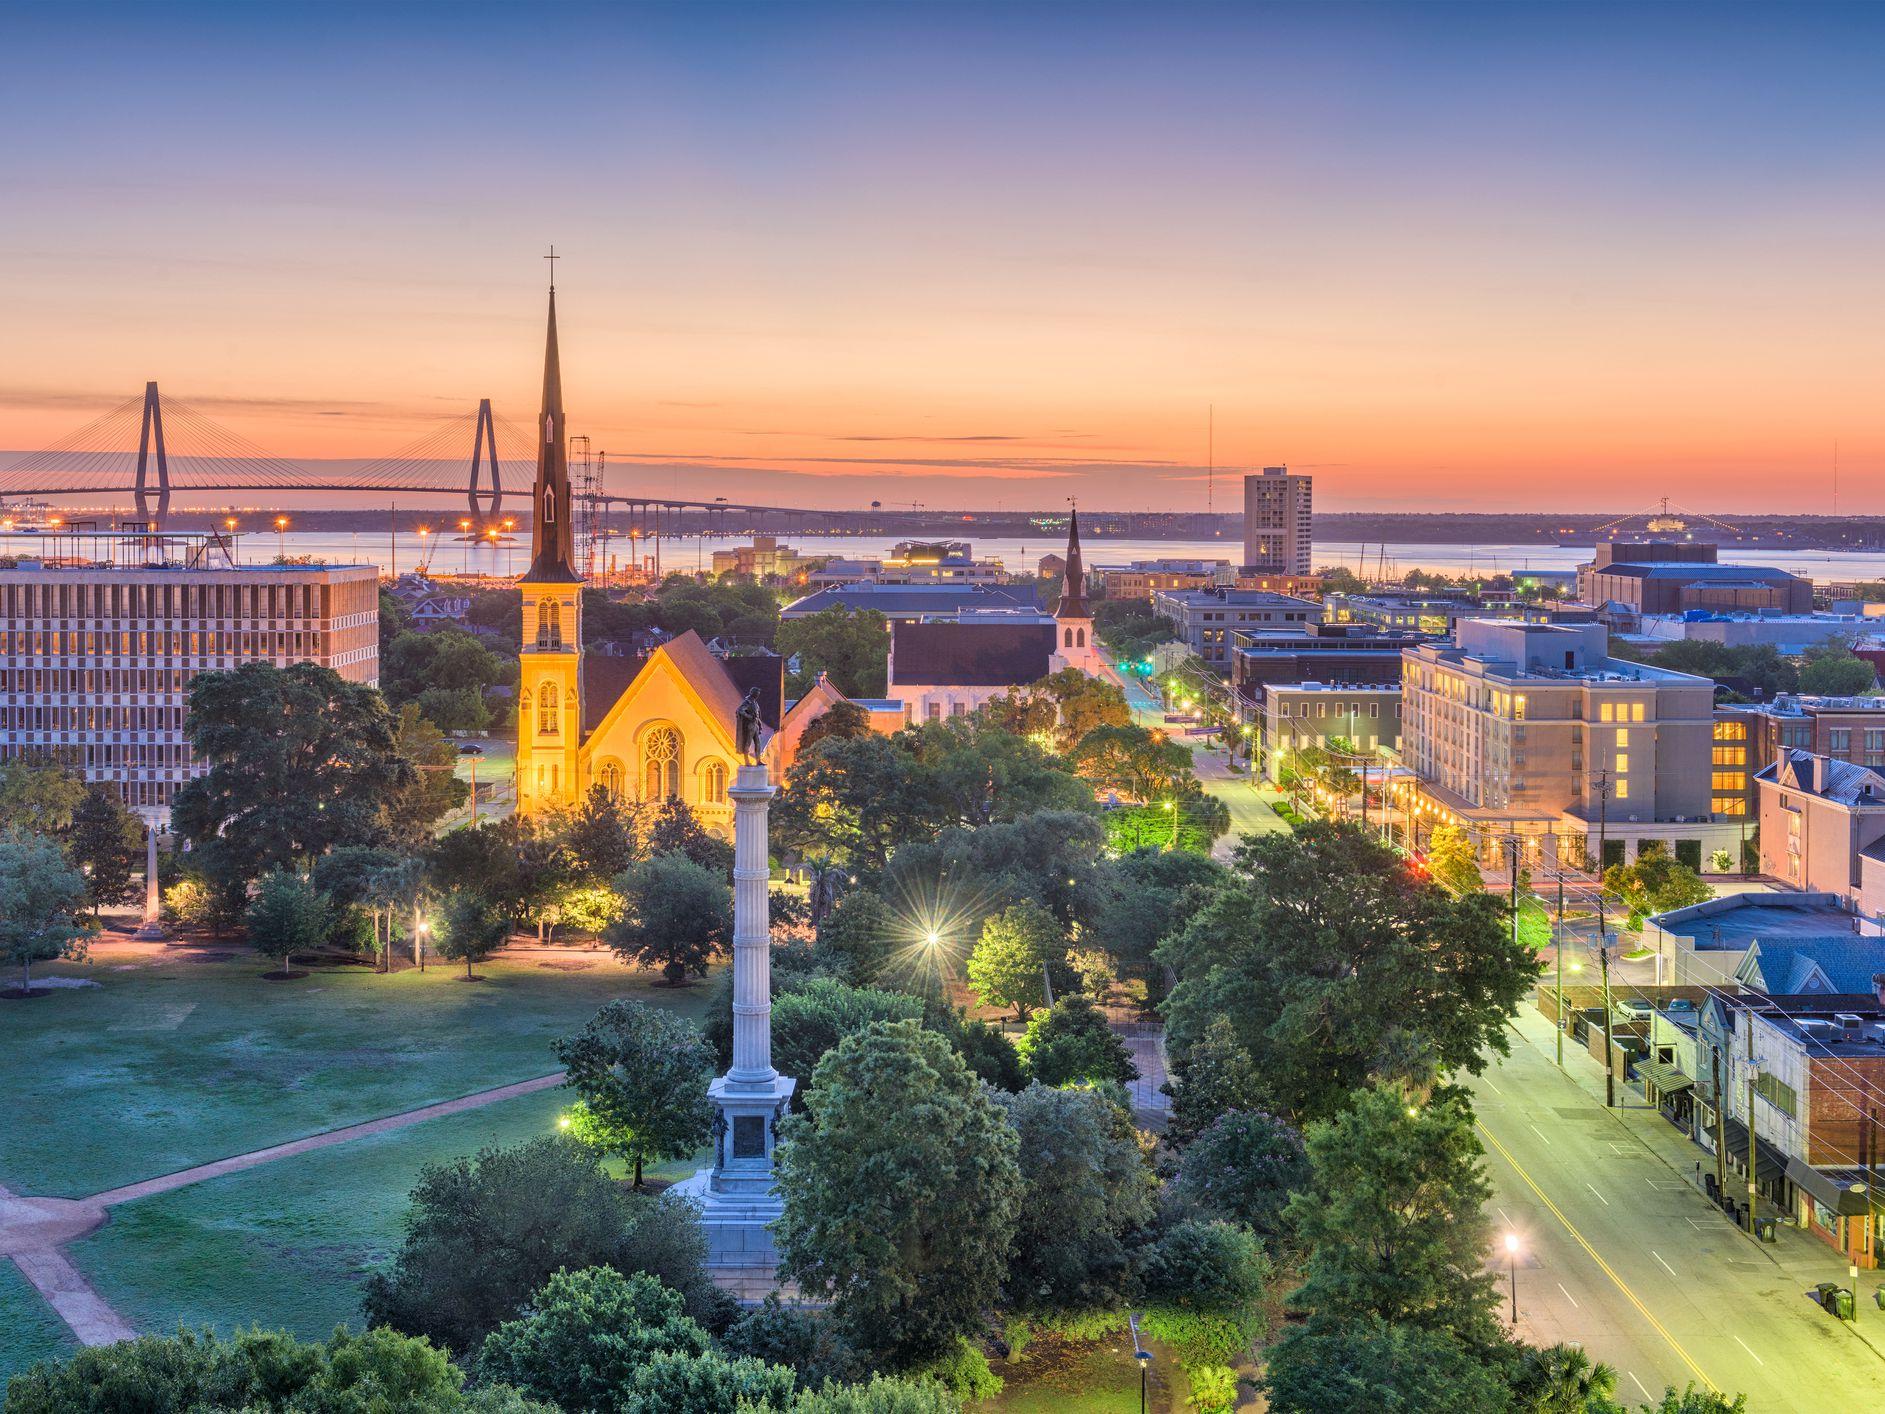 Gay Nightlife in Charleston, S.C.: Best Bars, Clubs, & More